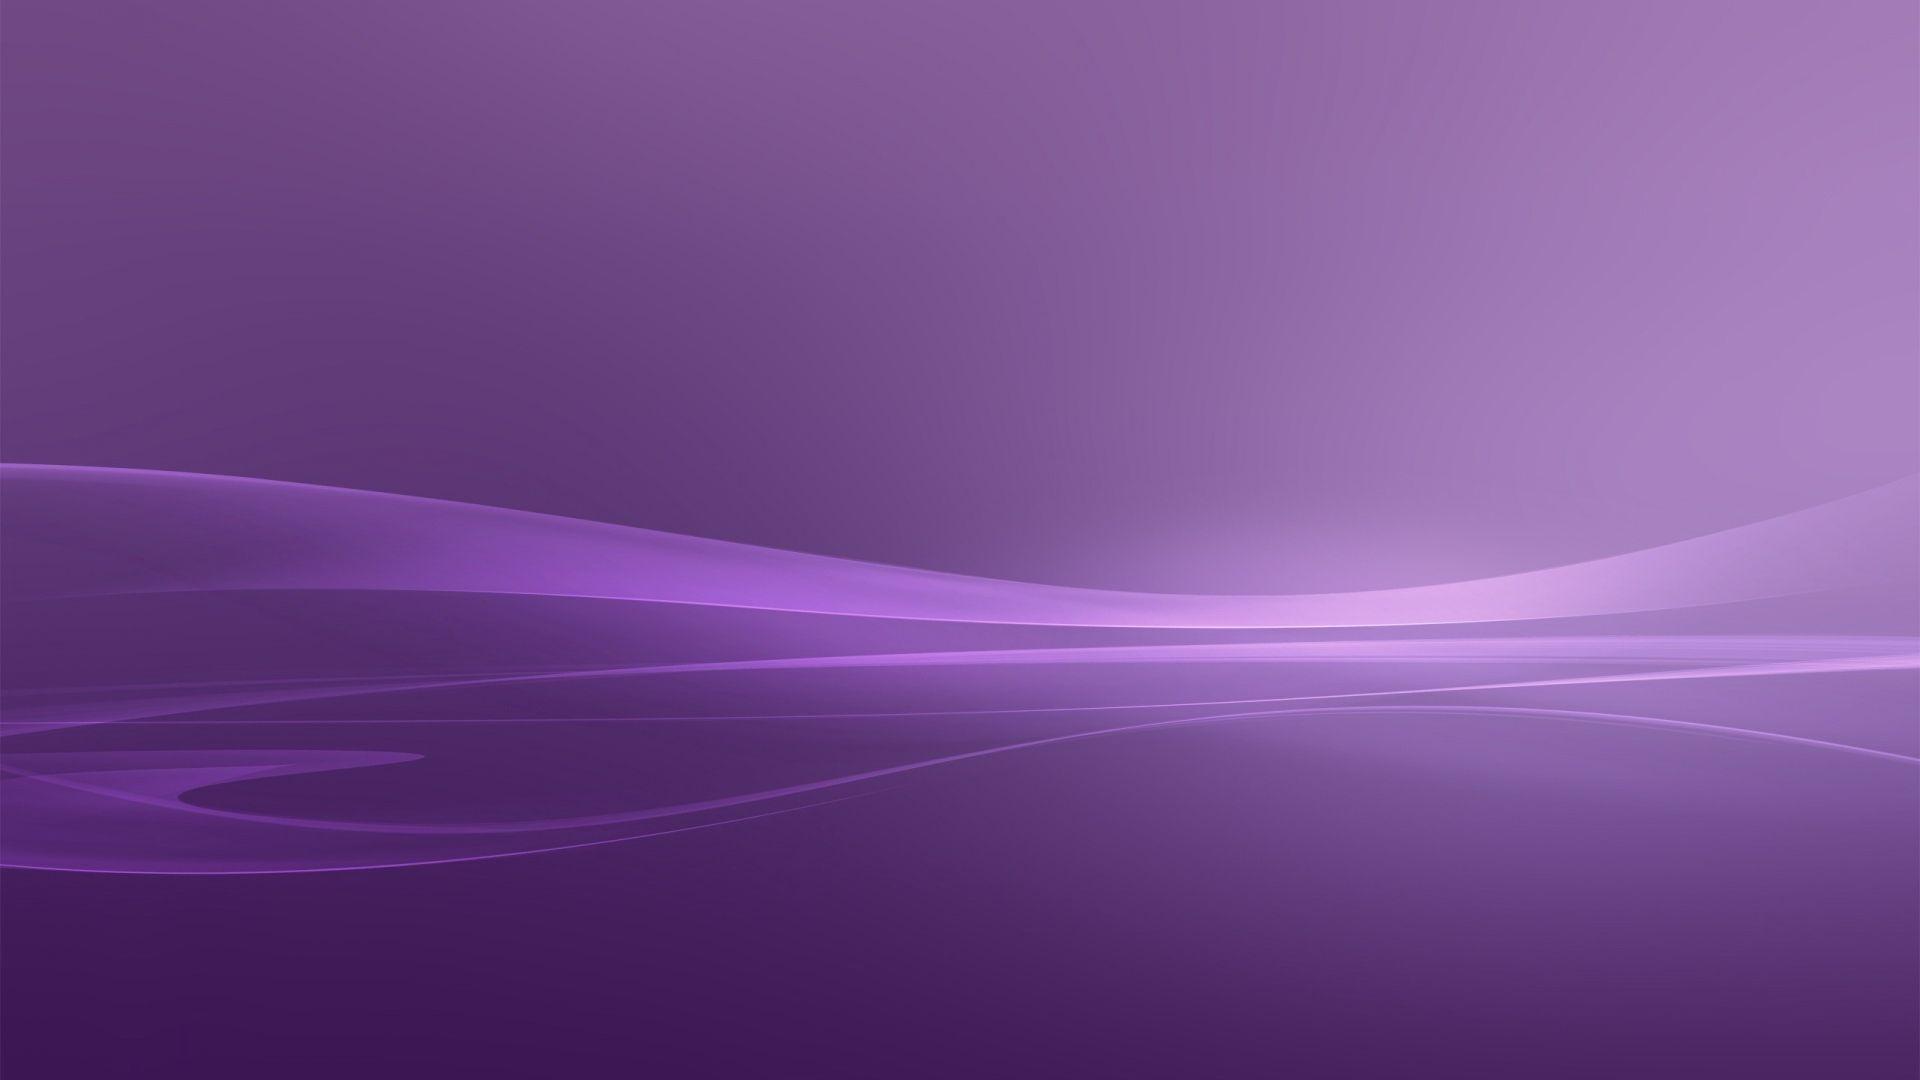 Green And Purple free hd wallpaper